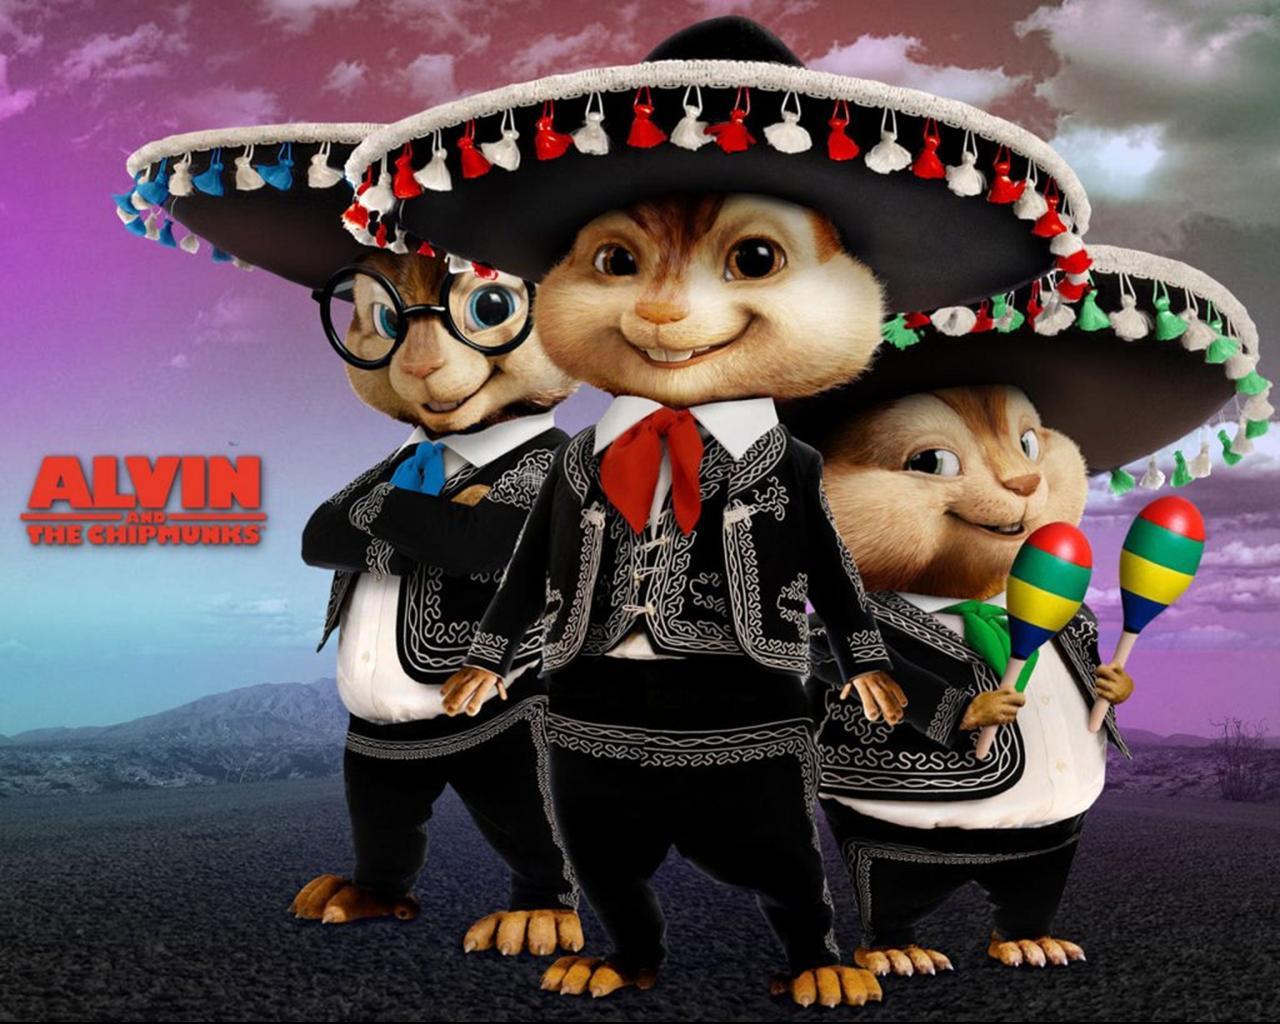 Элвин и бурундуки Alvin and the Chipmunks обои (14 фото) скачать ...